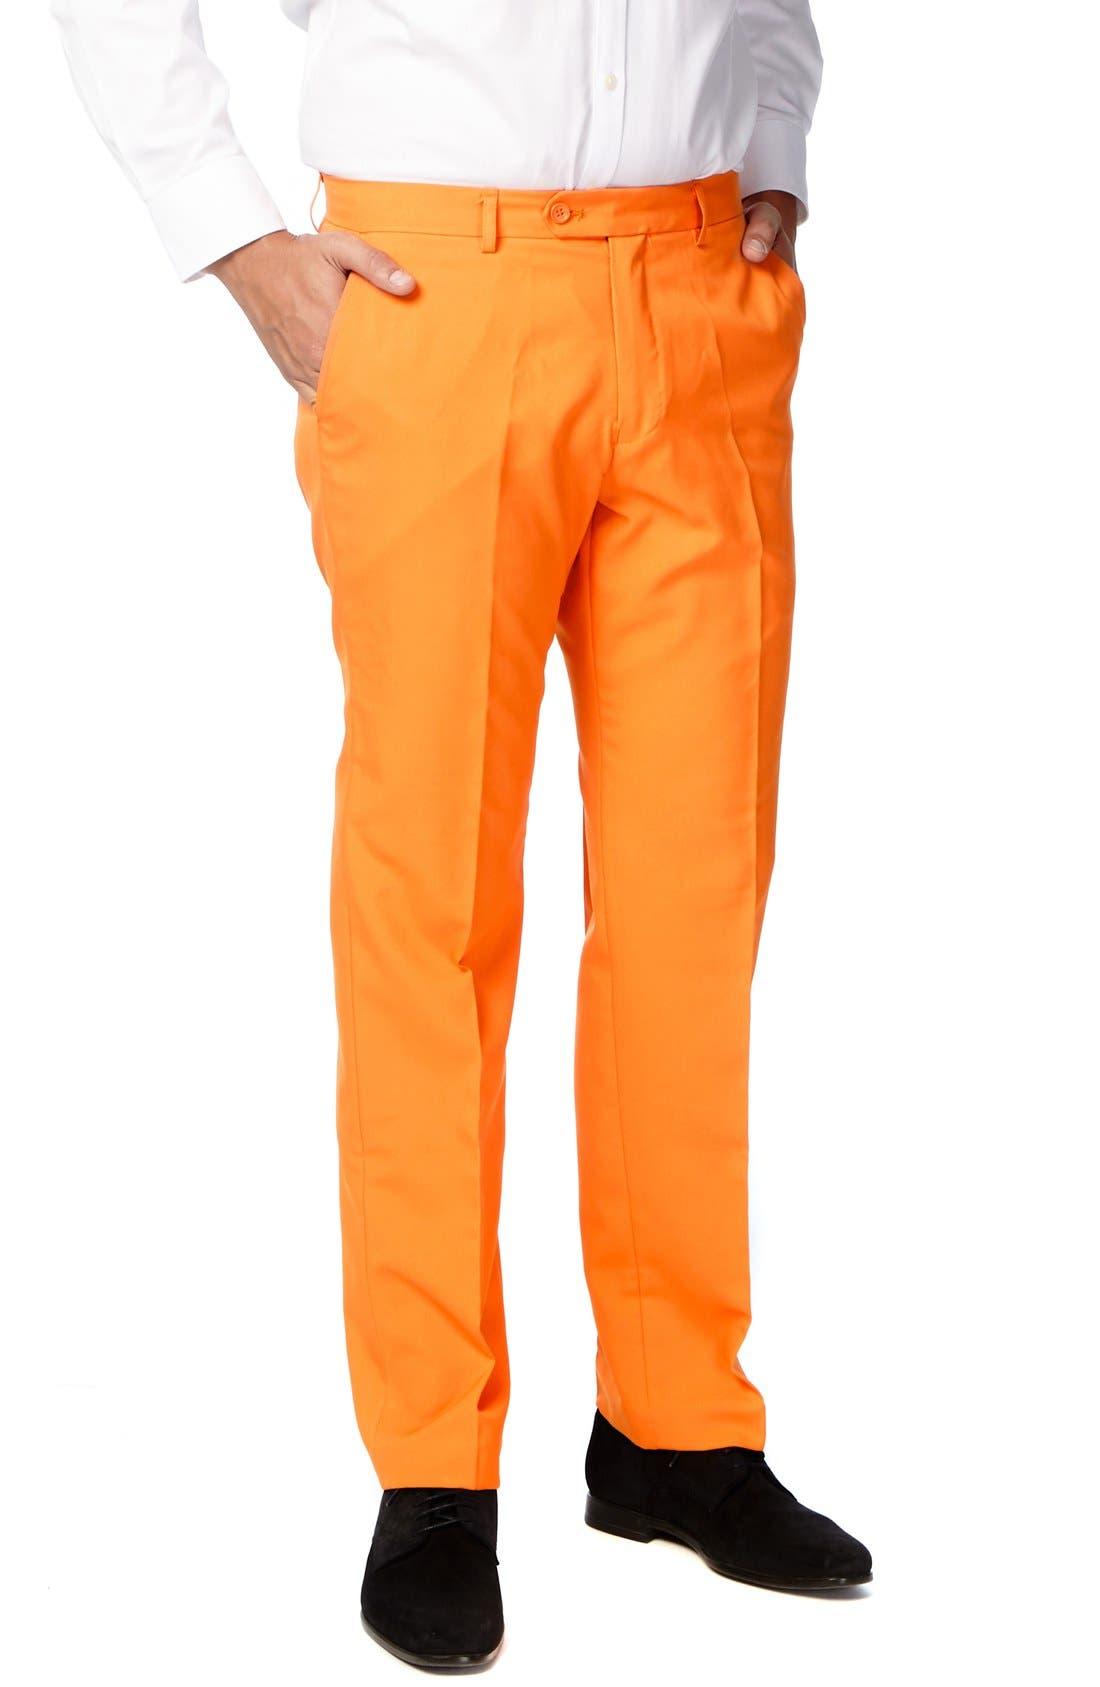 'The Orange' Trim Fit Two-Piece Suit with Tie,                             Alternate thumbnail 3, color,